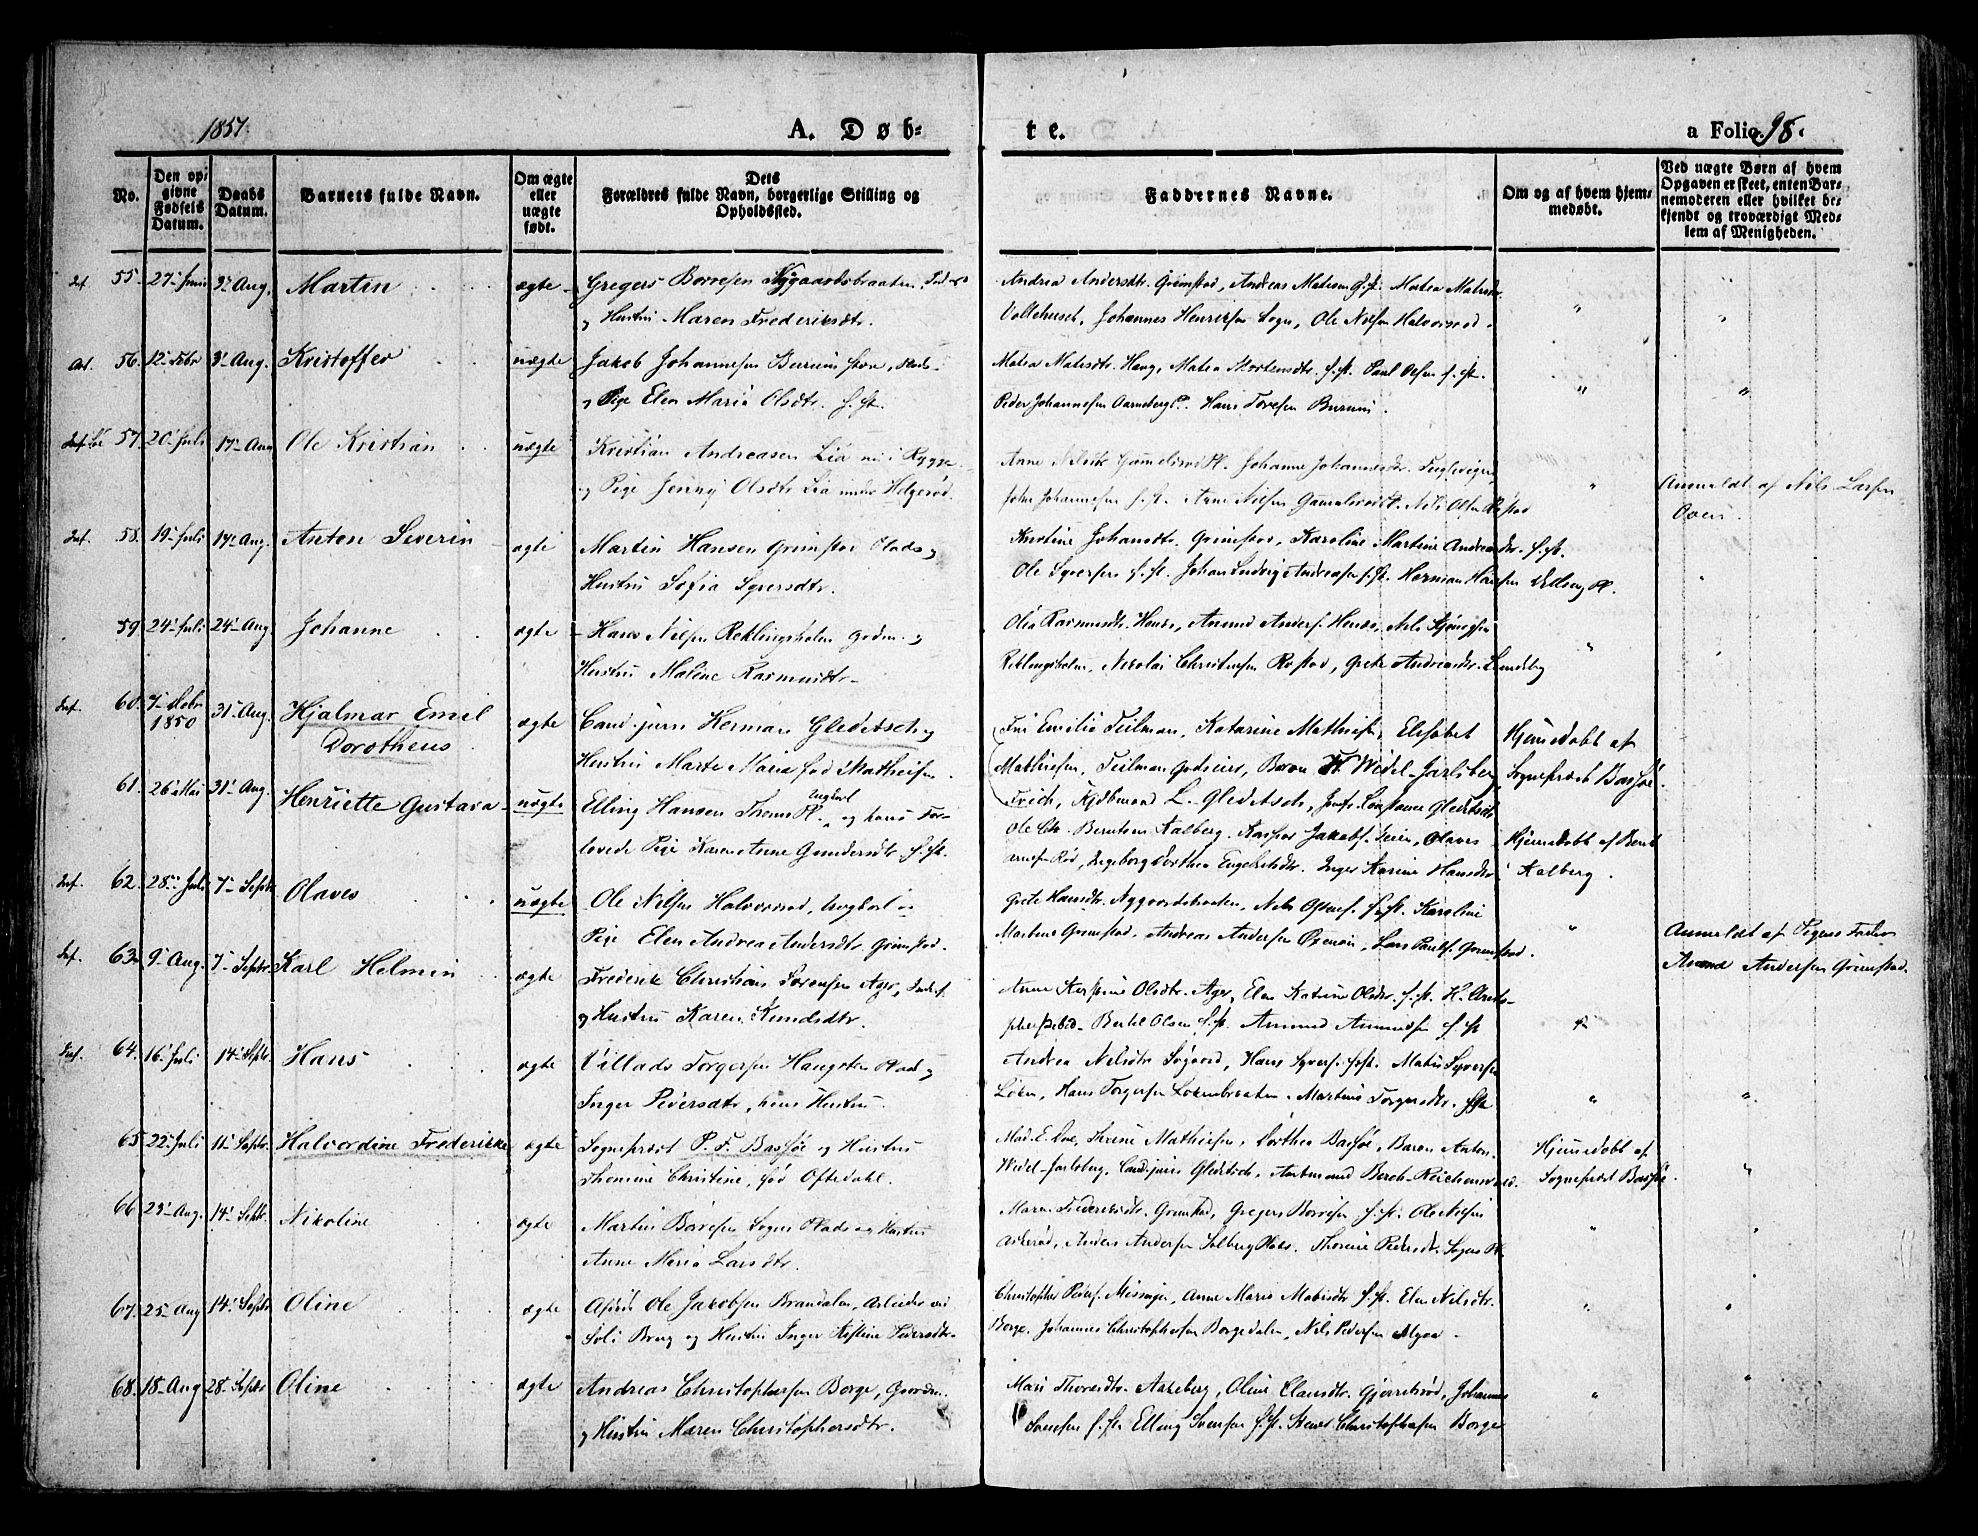 SAO, Råde prestekontor kirkebøker, F/Fa/L0005: Ministerialbok nr. 5, 1830-1853, s. 98